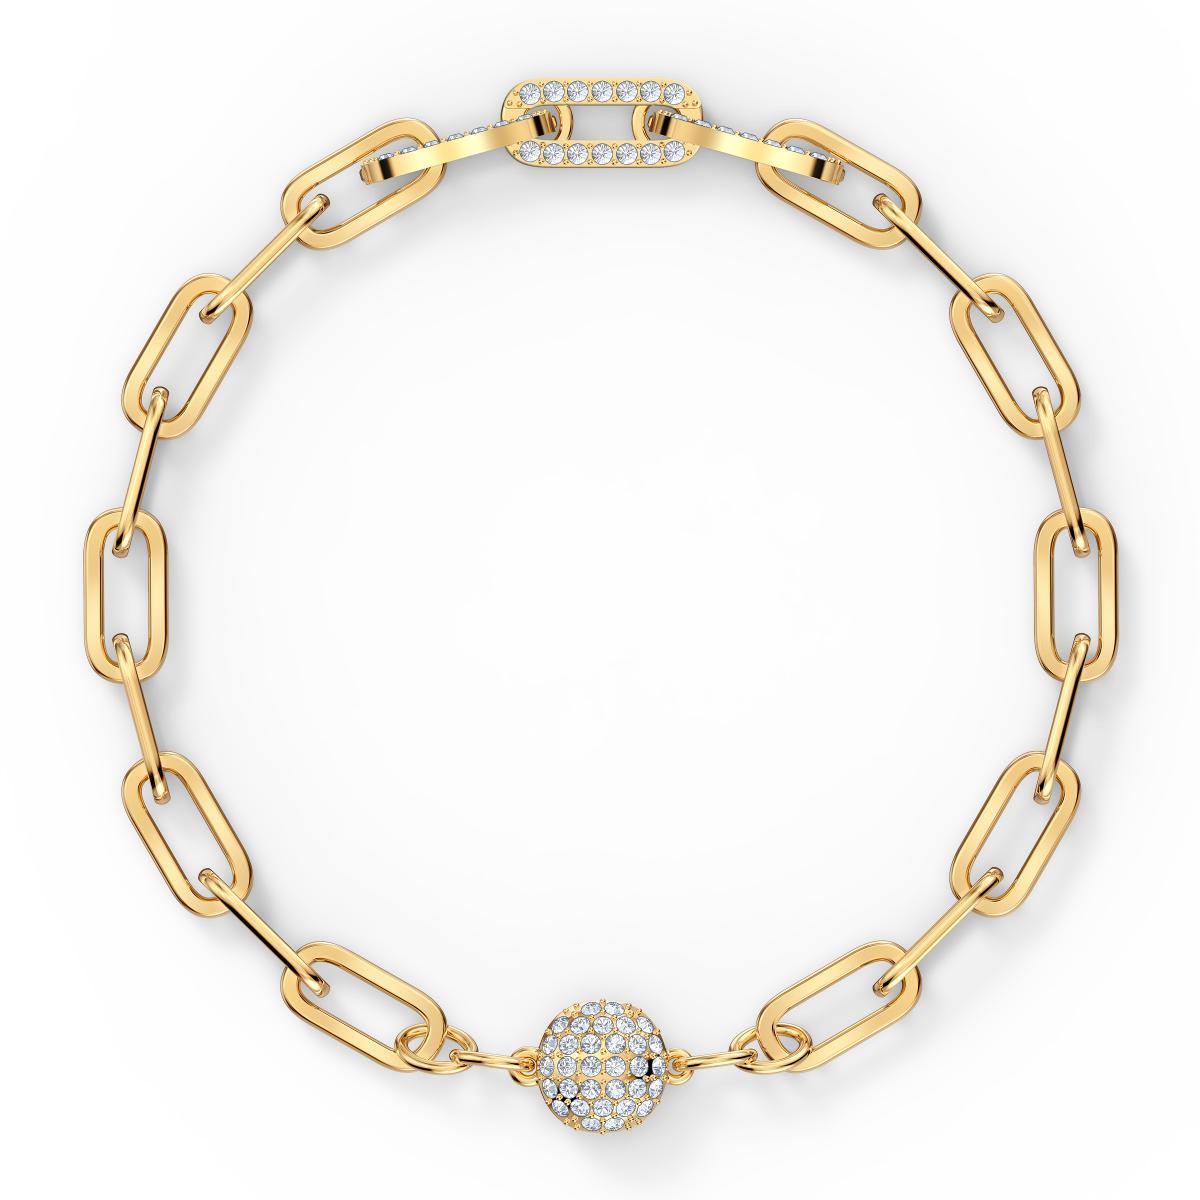 Bracelet Swarovski 5572639 - Bracelet Femme